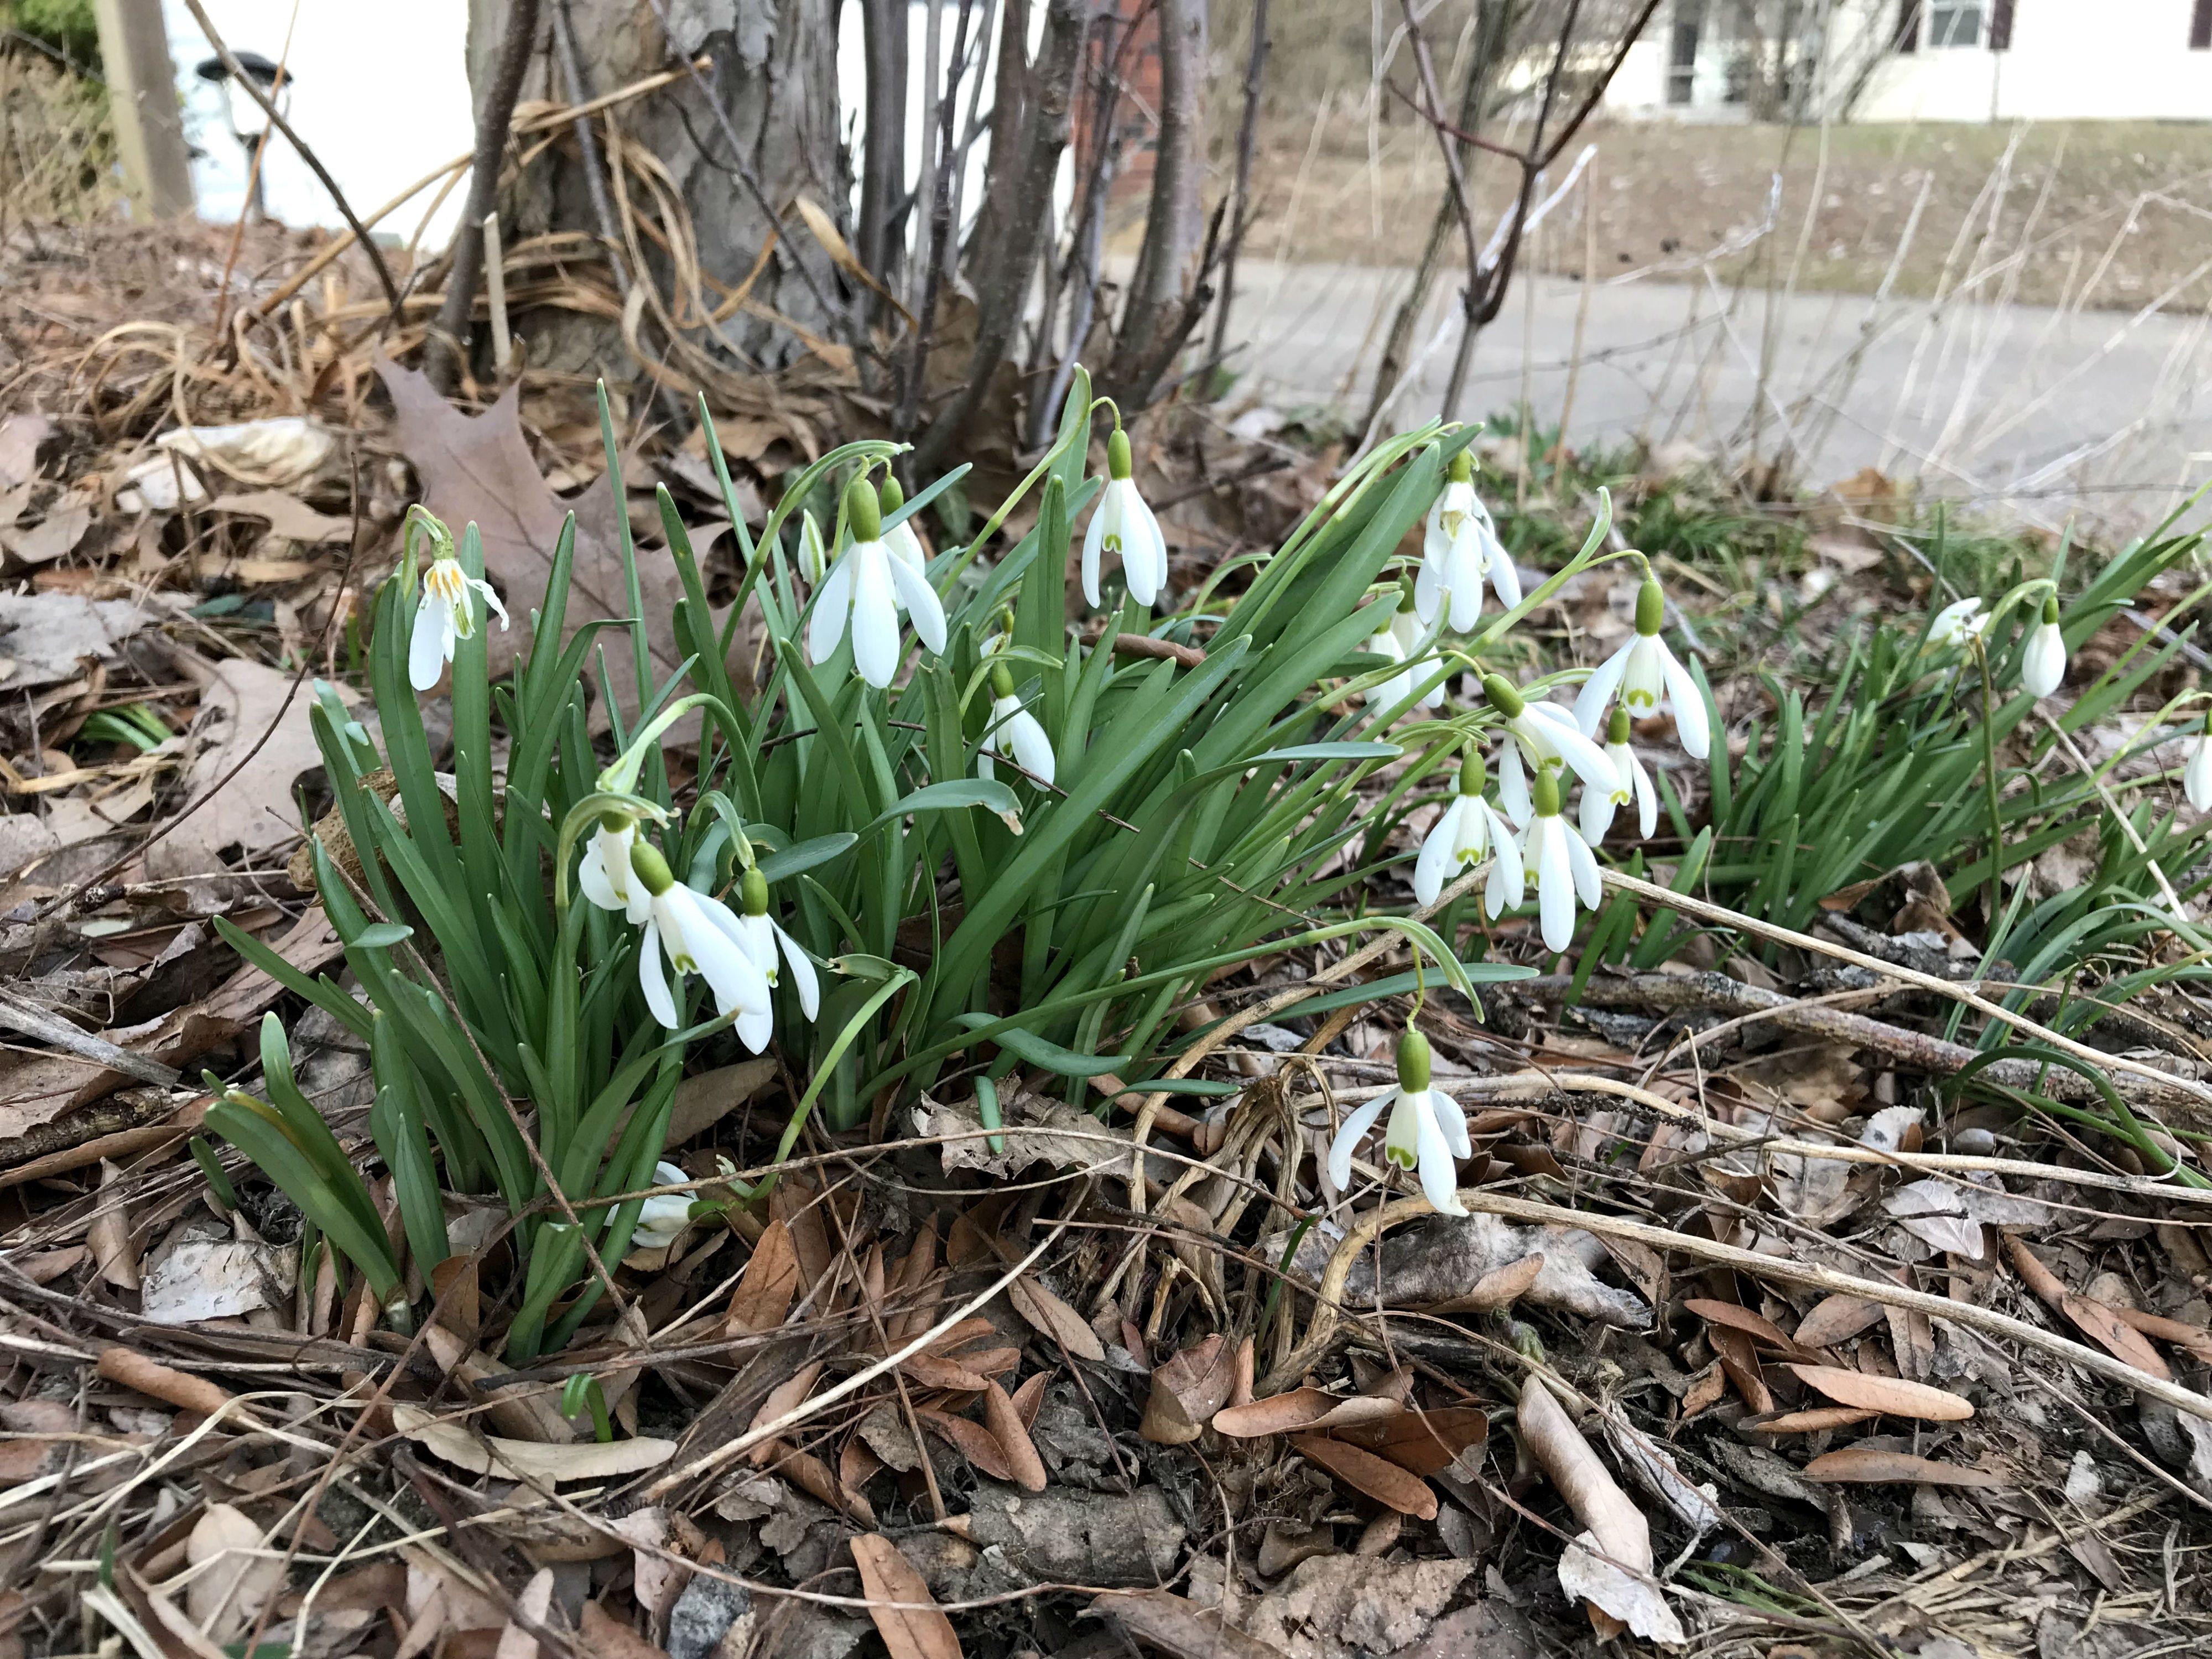 Snowdrops are in bloom on Saturday, April 13, 2019, in South Burlington.